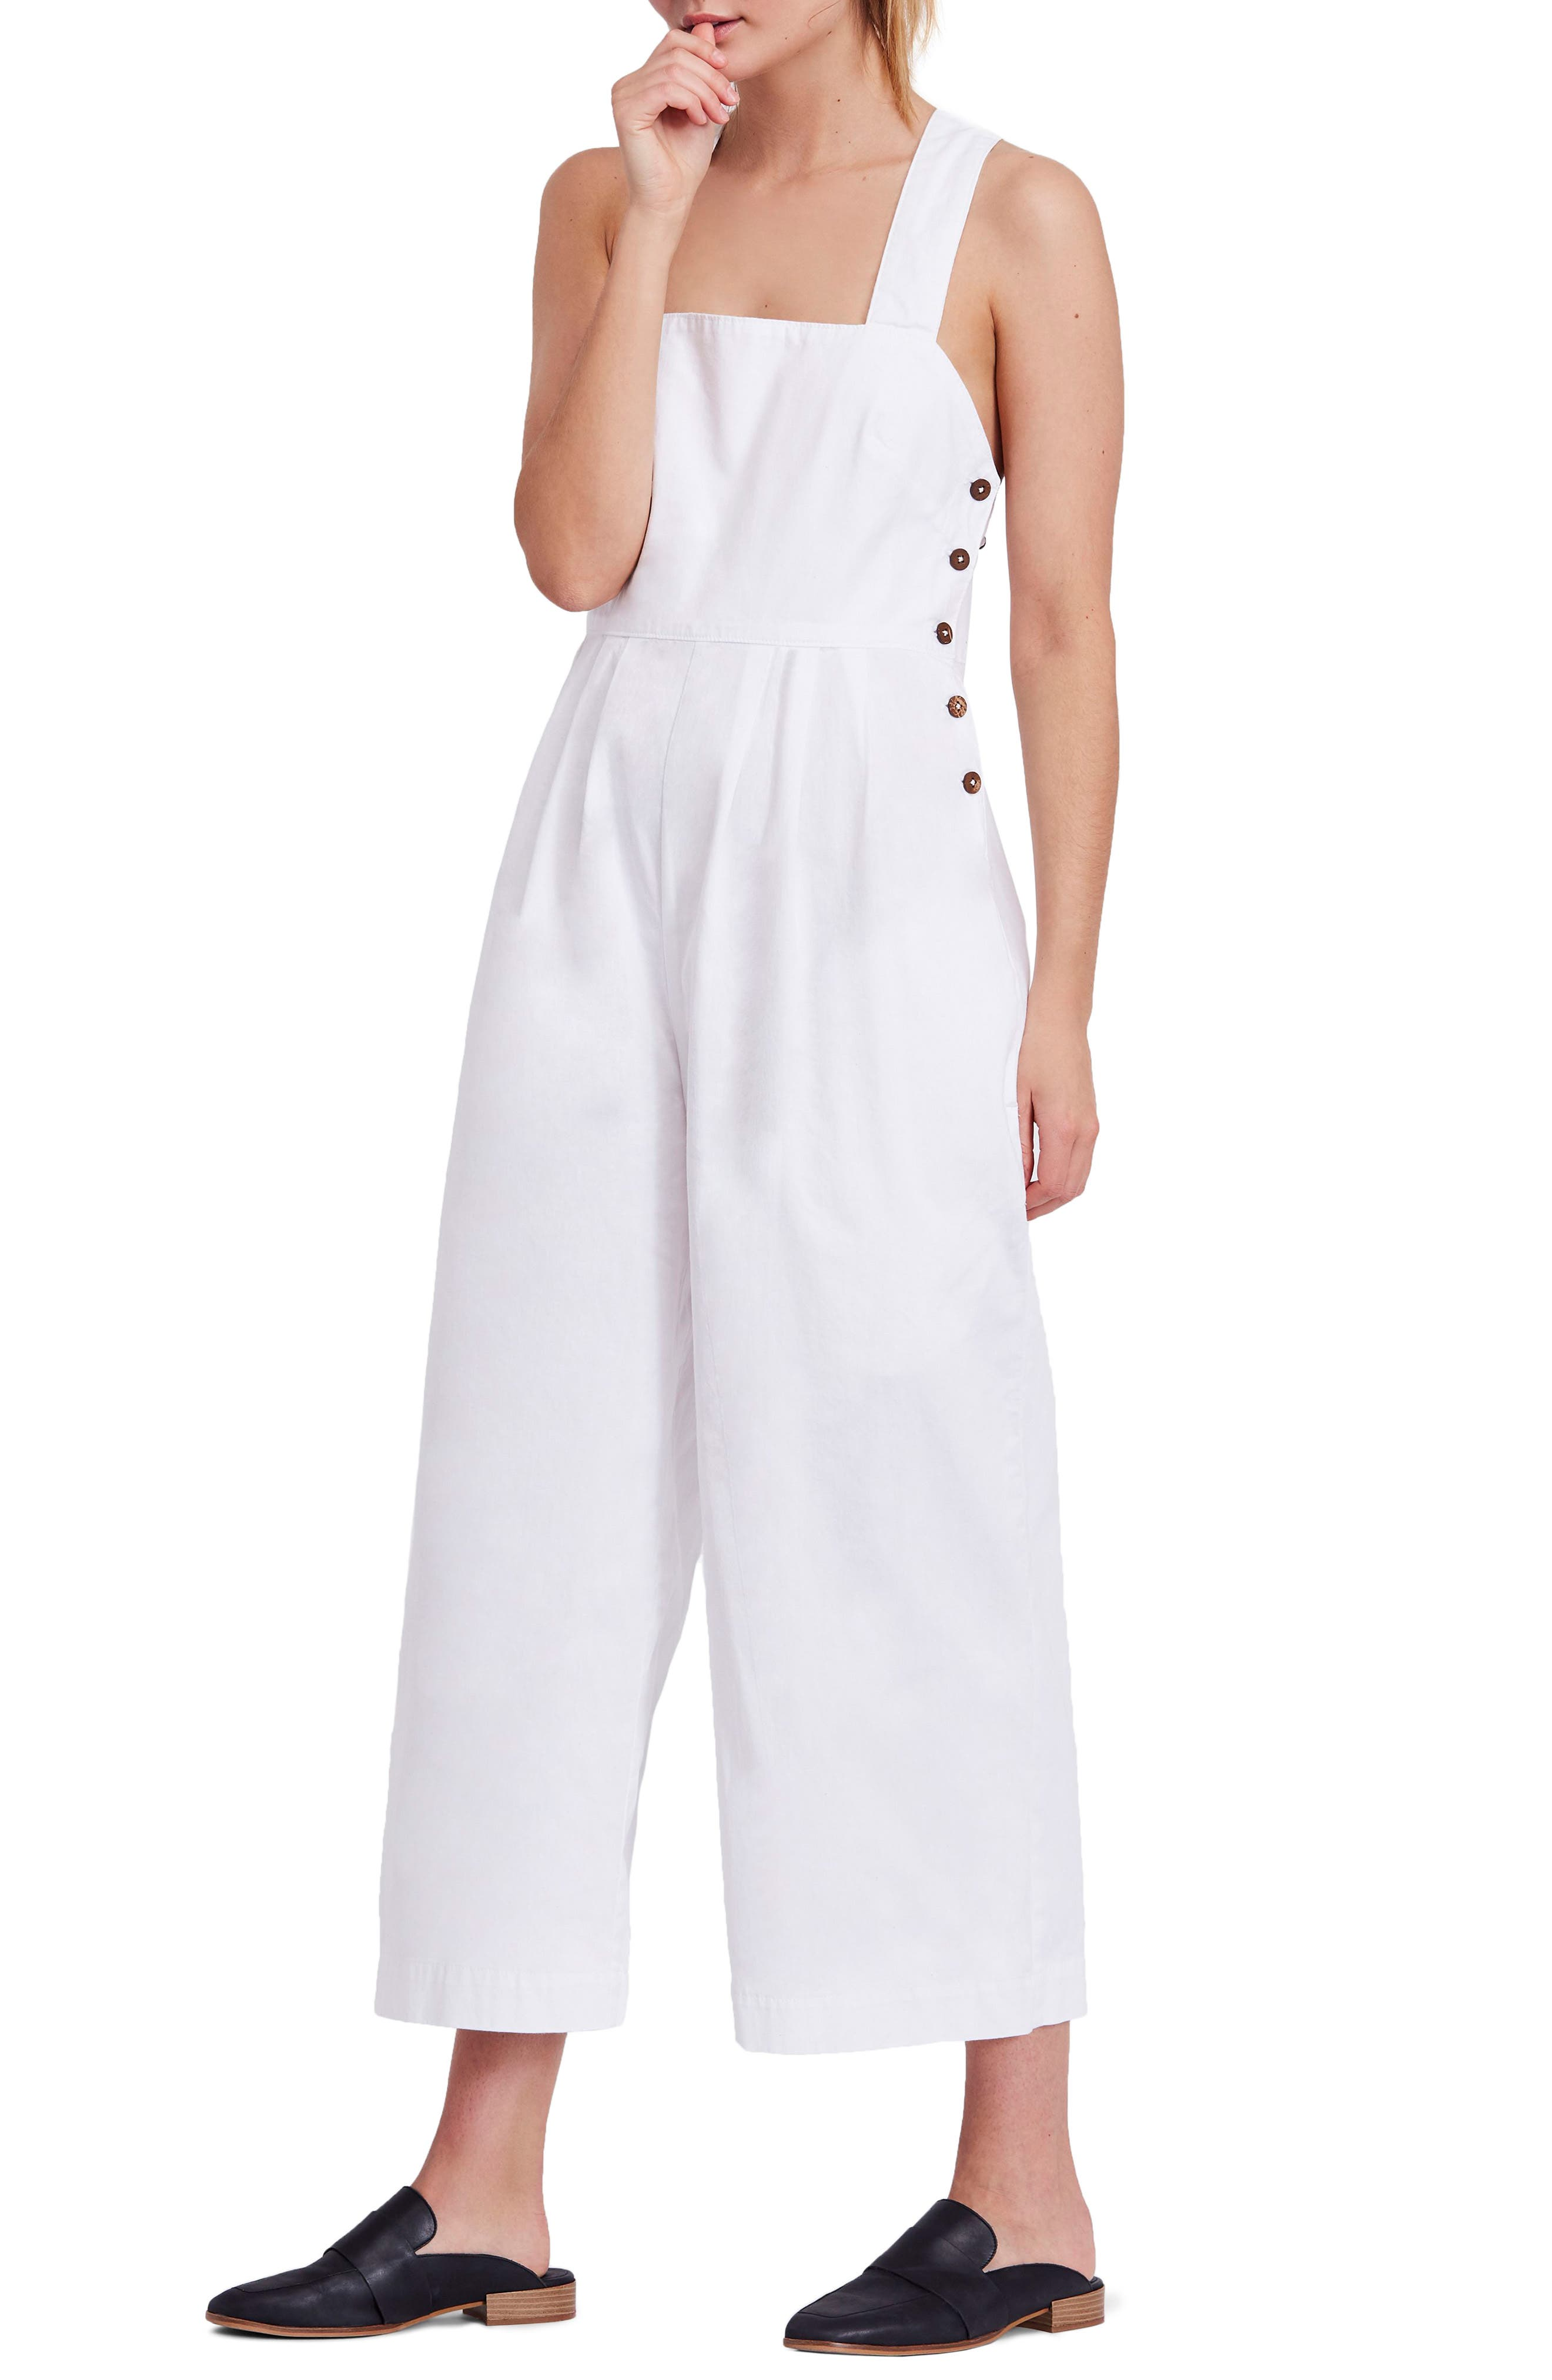 Fara Jumpsuit,                         Main,                         color, White